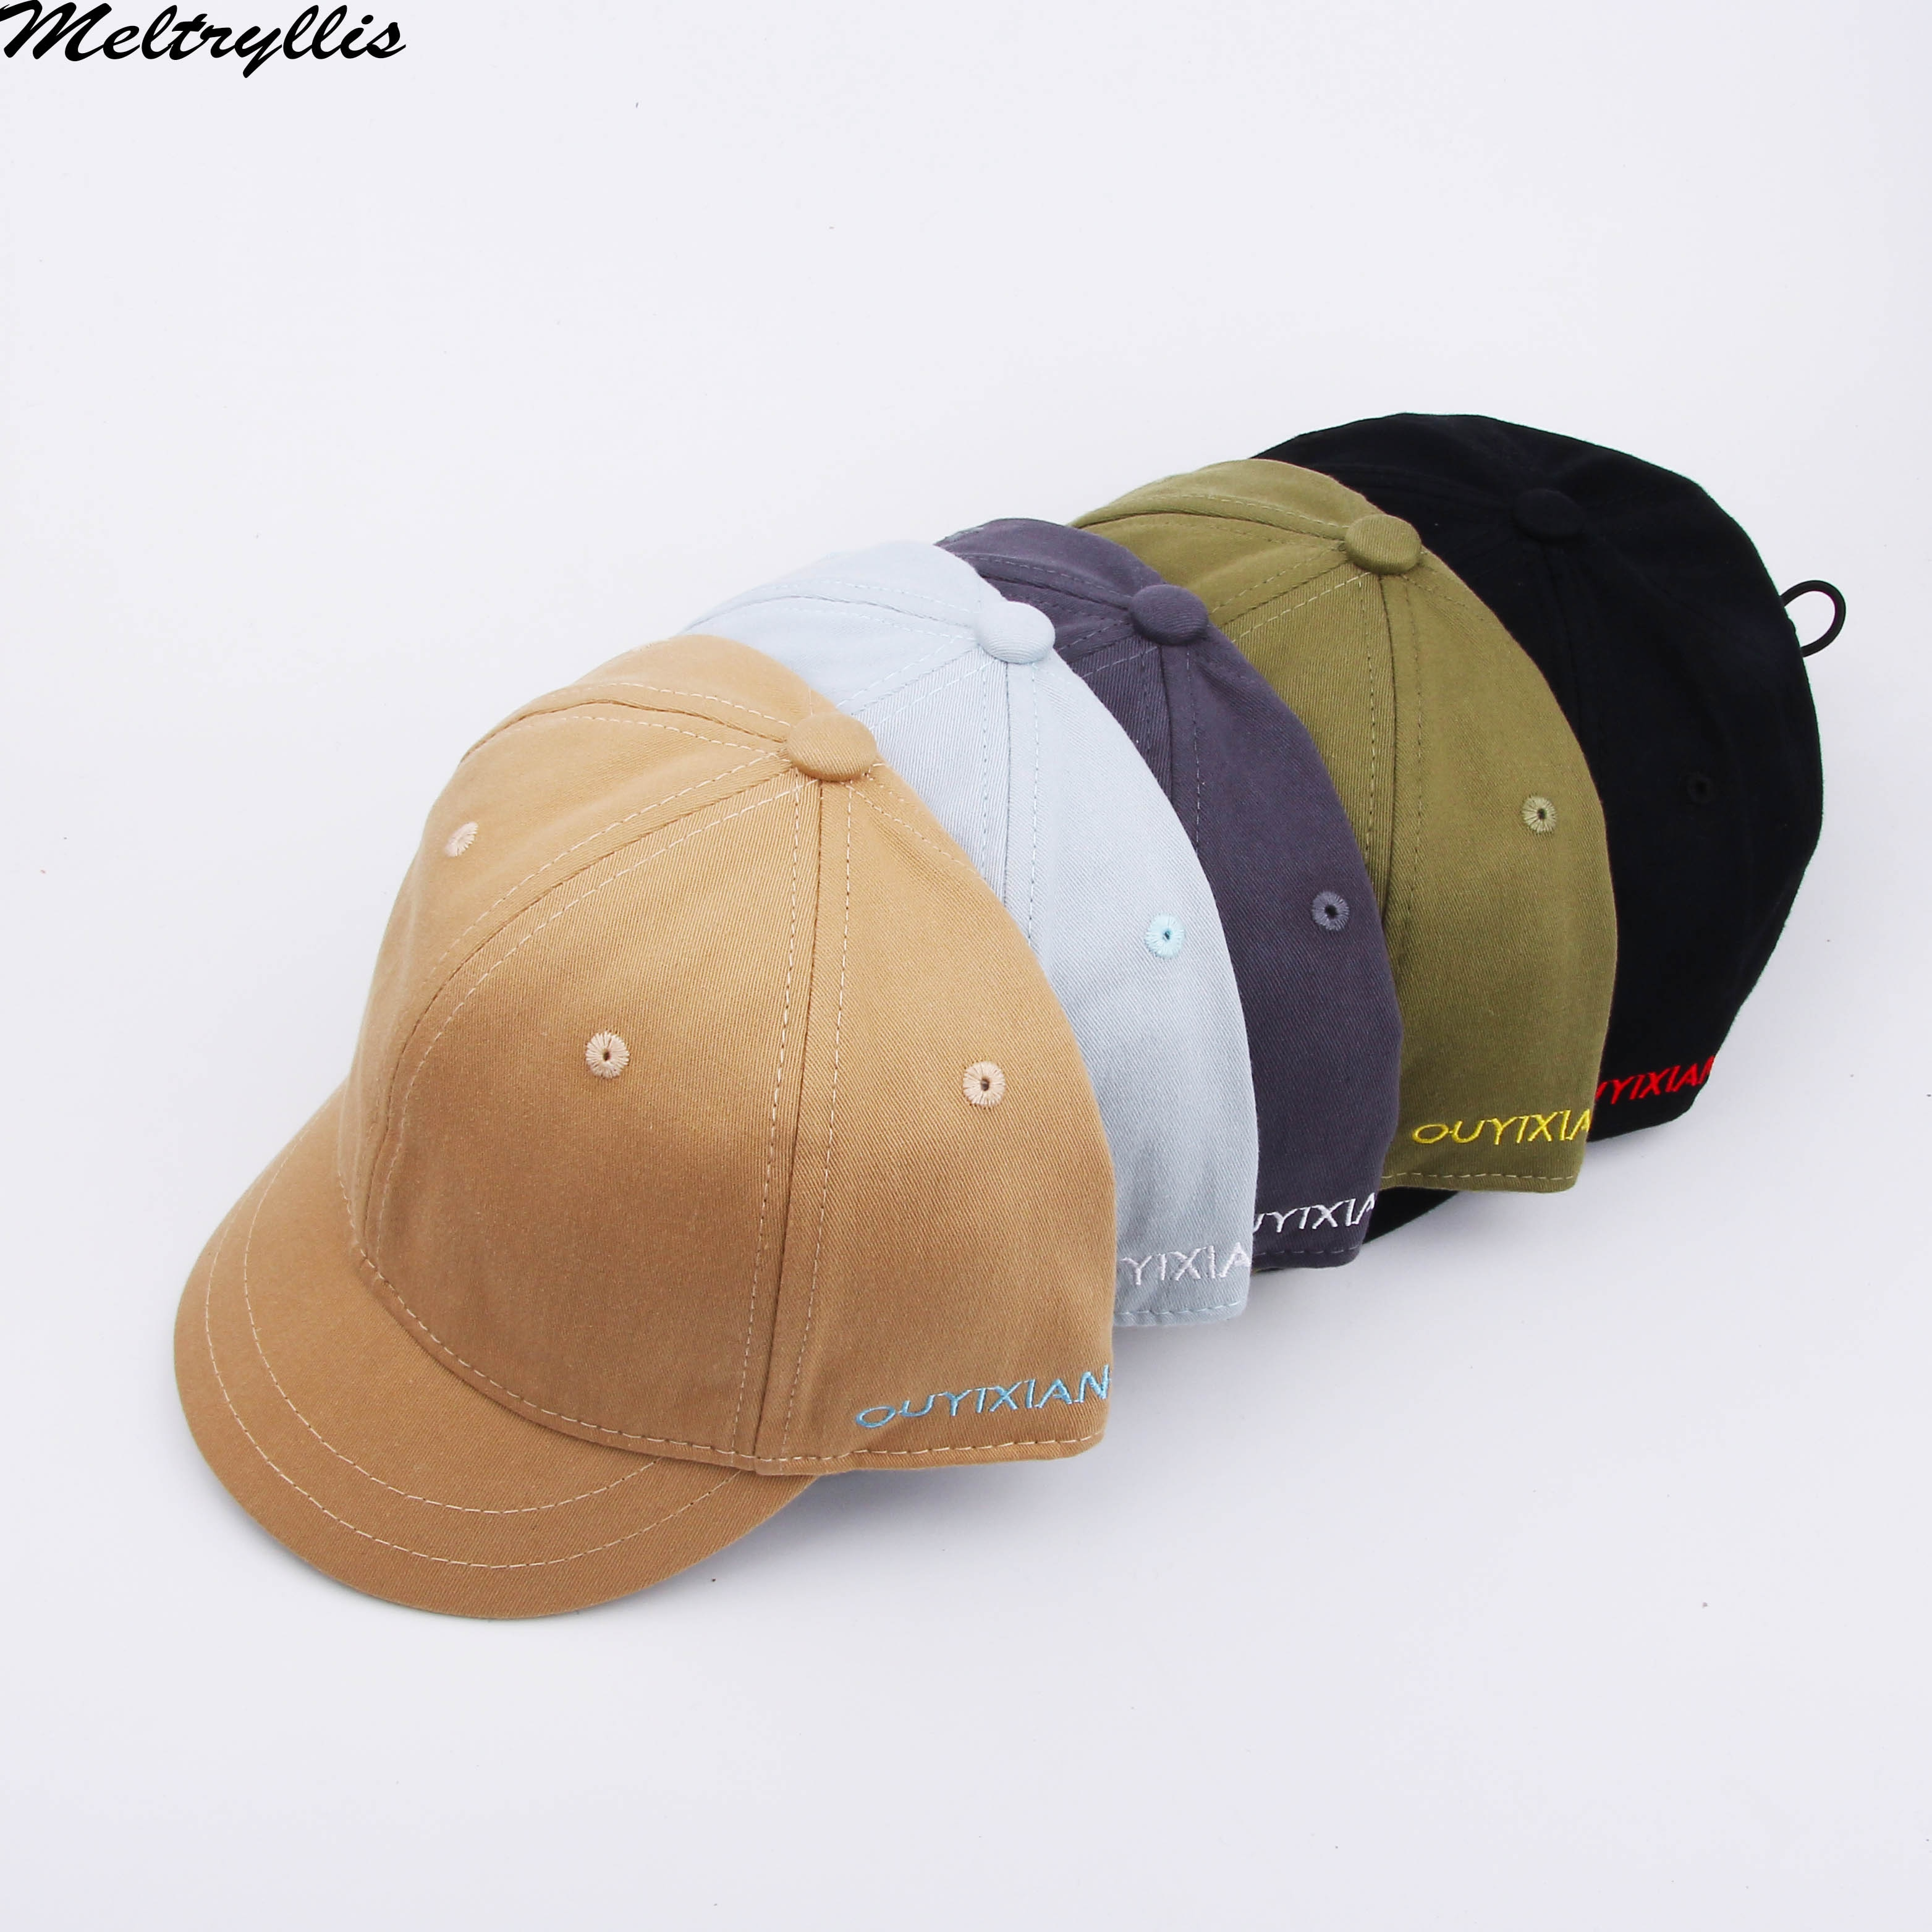 [Meltryllis]New Spring Cotton Short Brim Baseball Cap Letters Embroidery Hat for Women Men outdoor Visor Cap casual Snapback Hat